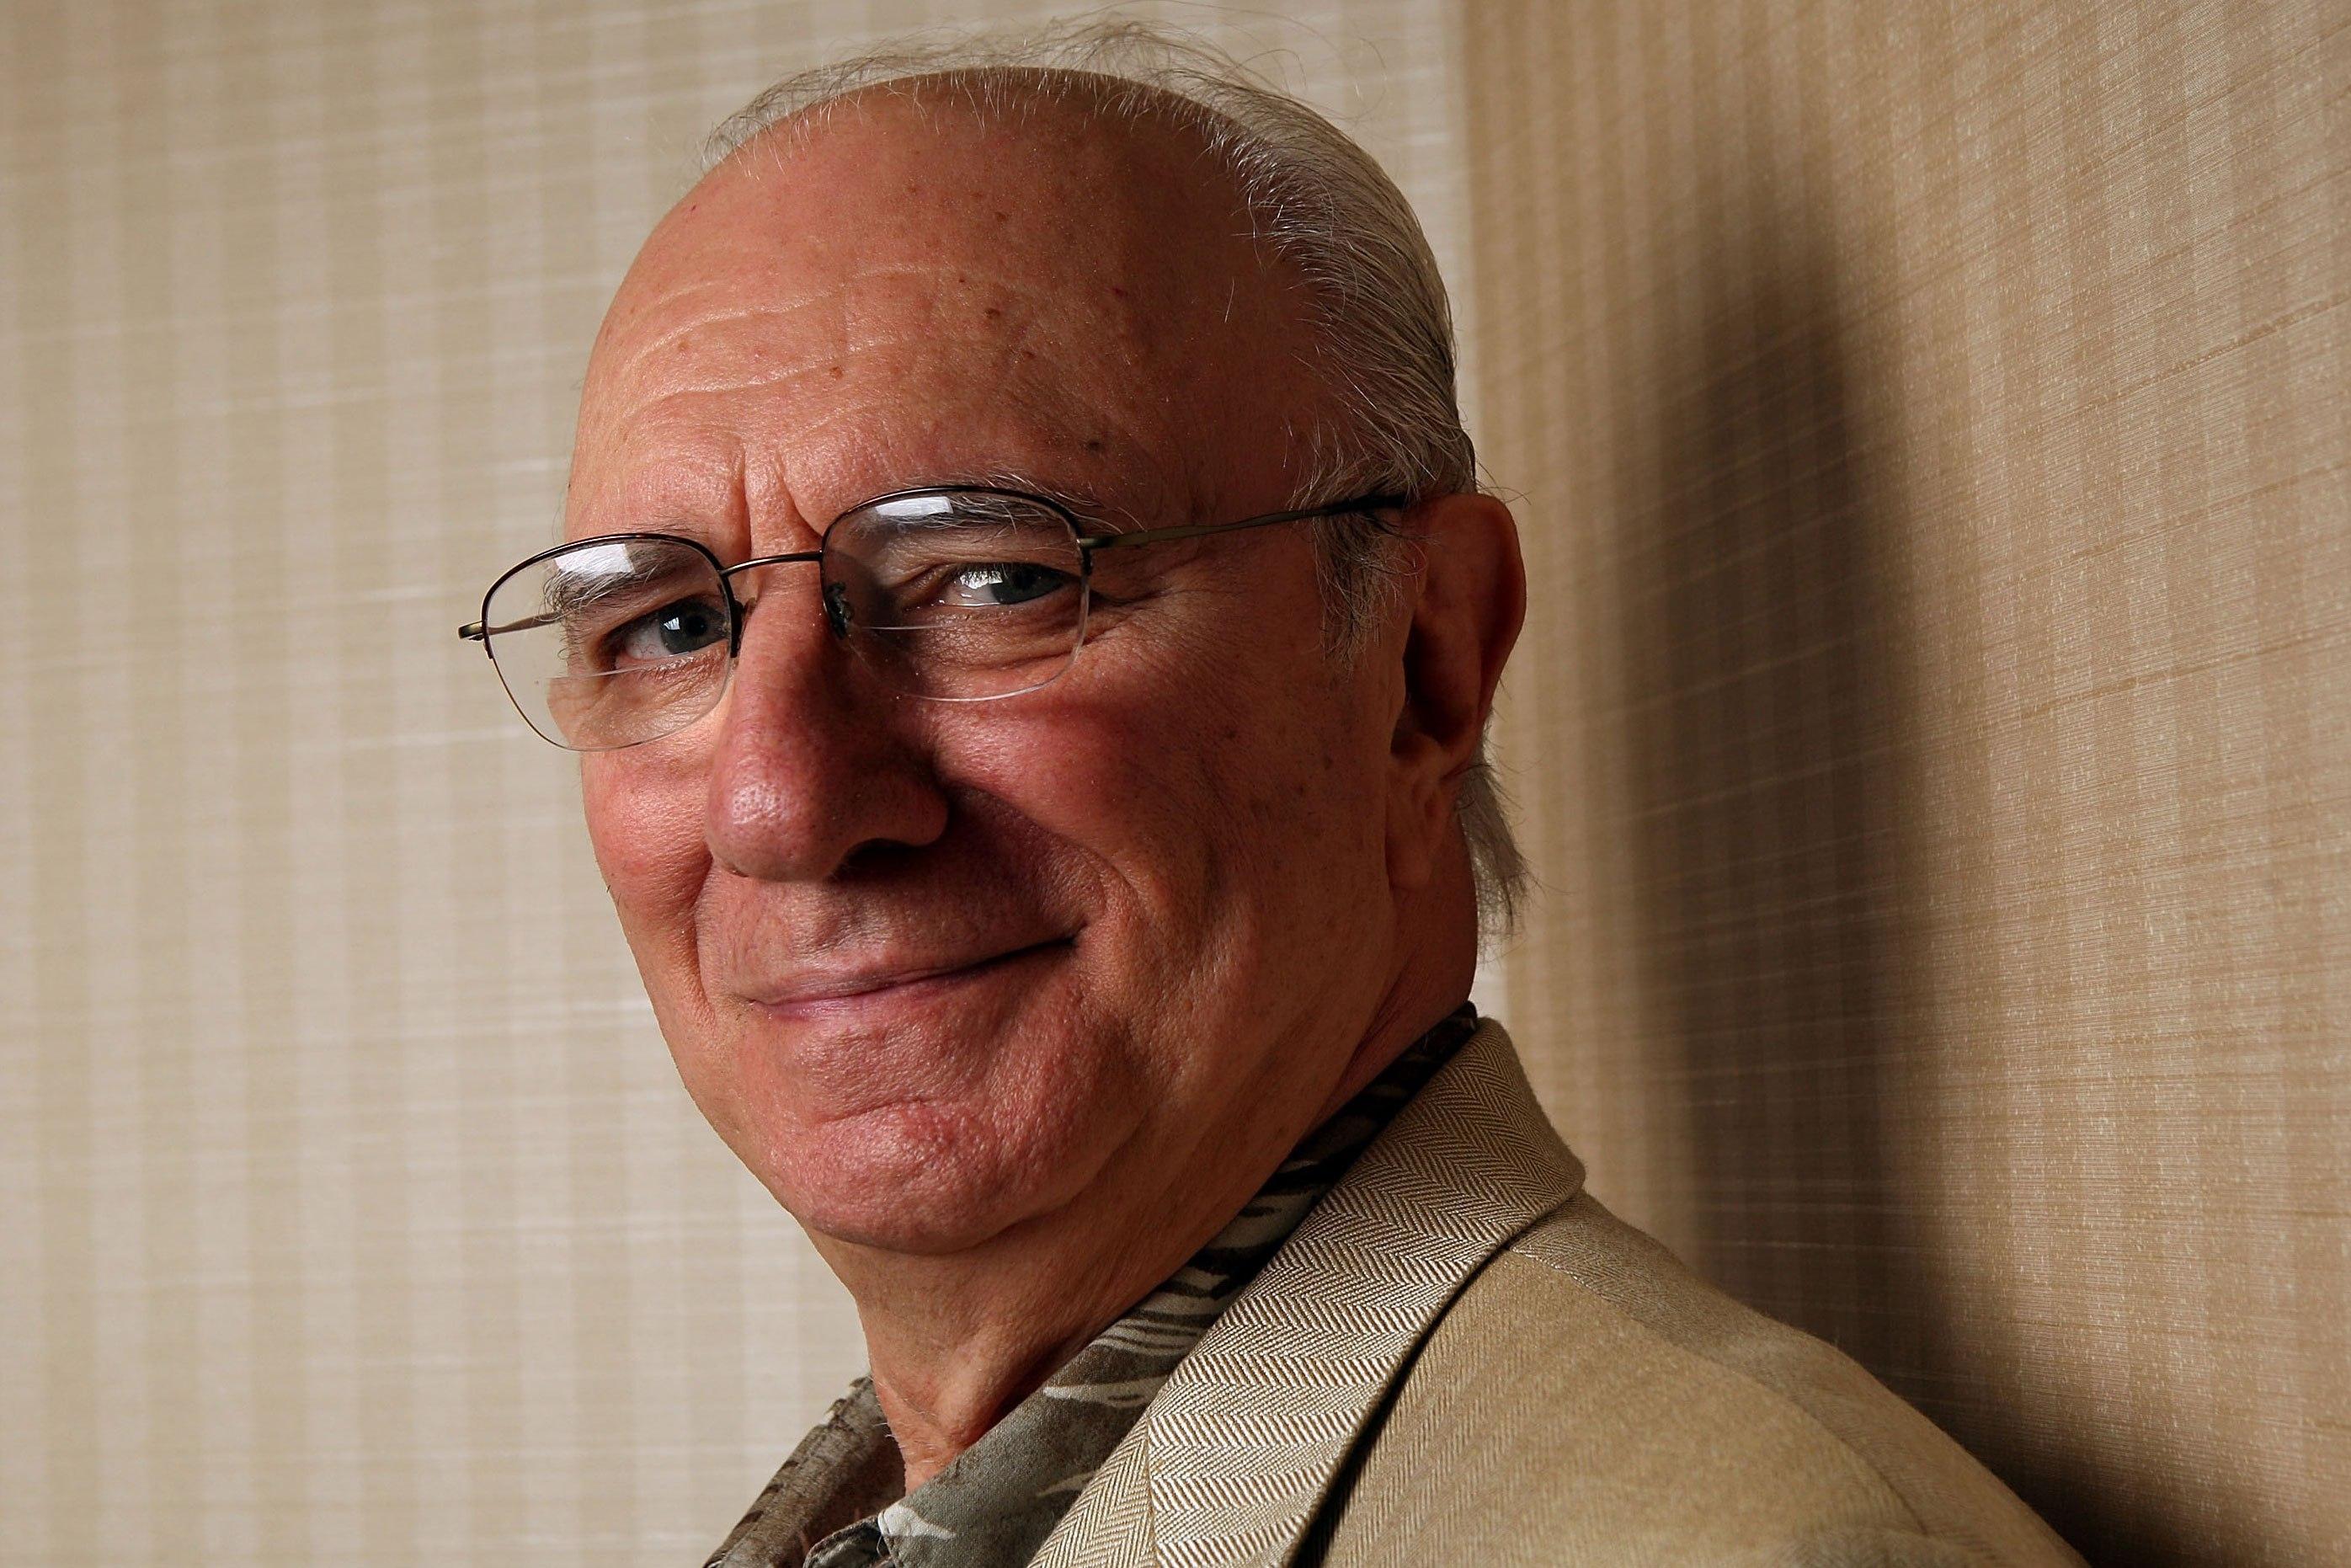 Tony-winning actor Philip Bosco dies at 88